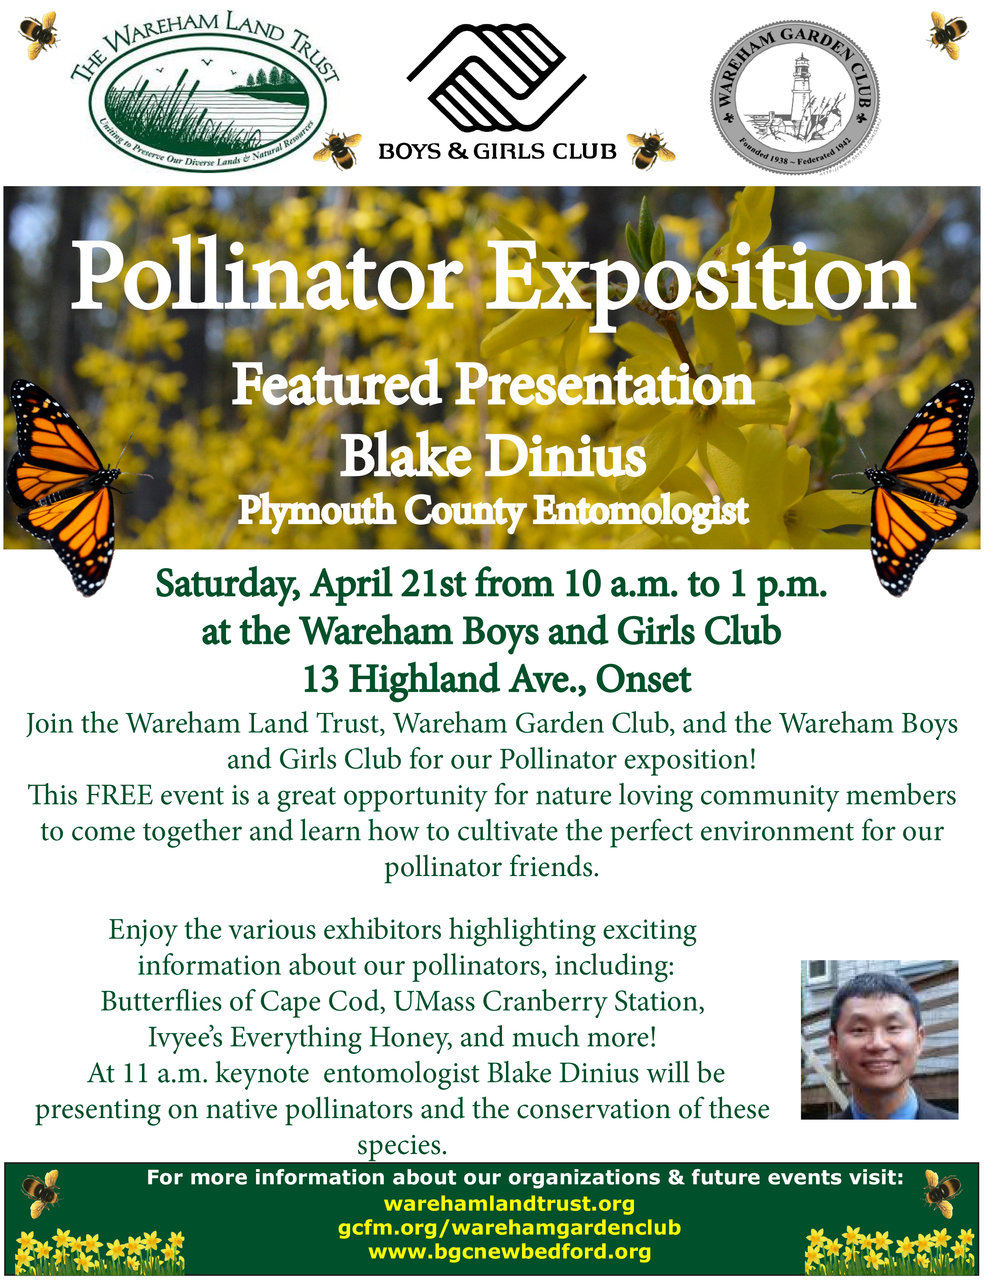 180421_wlt pollinator expo.jpg